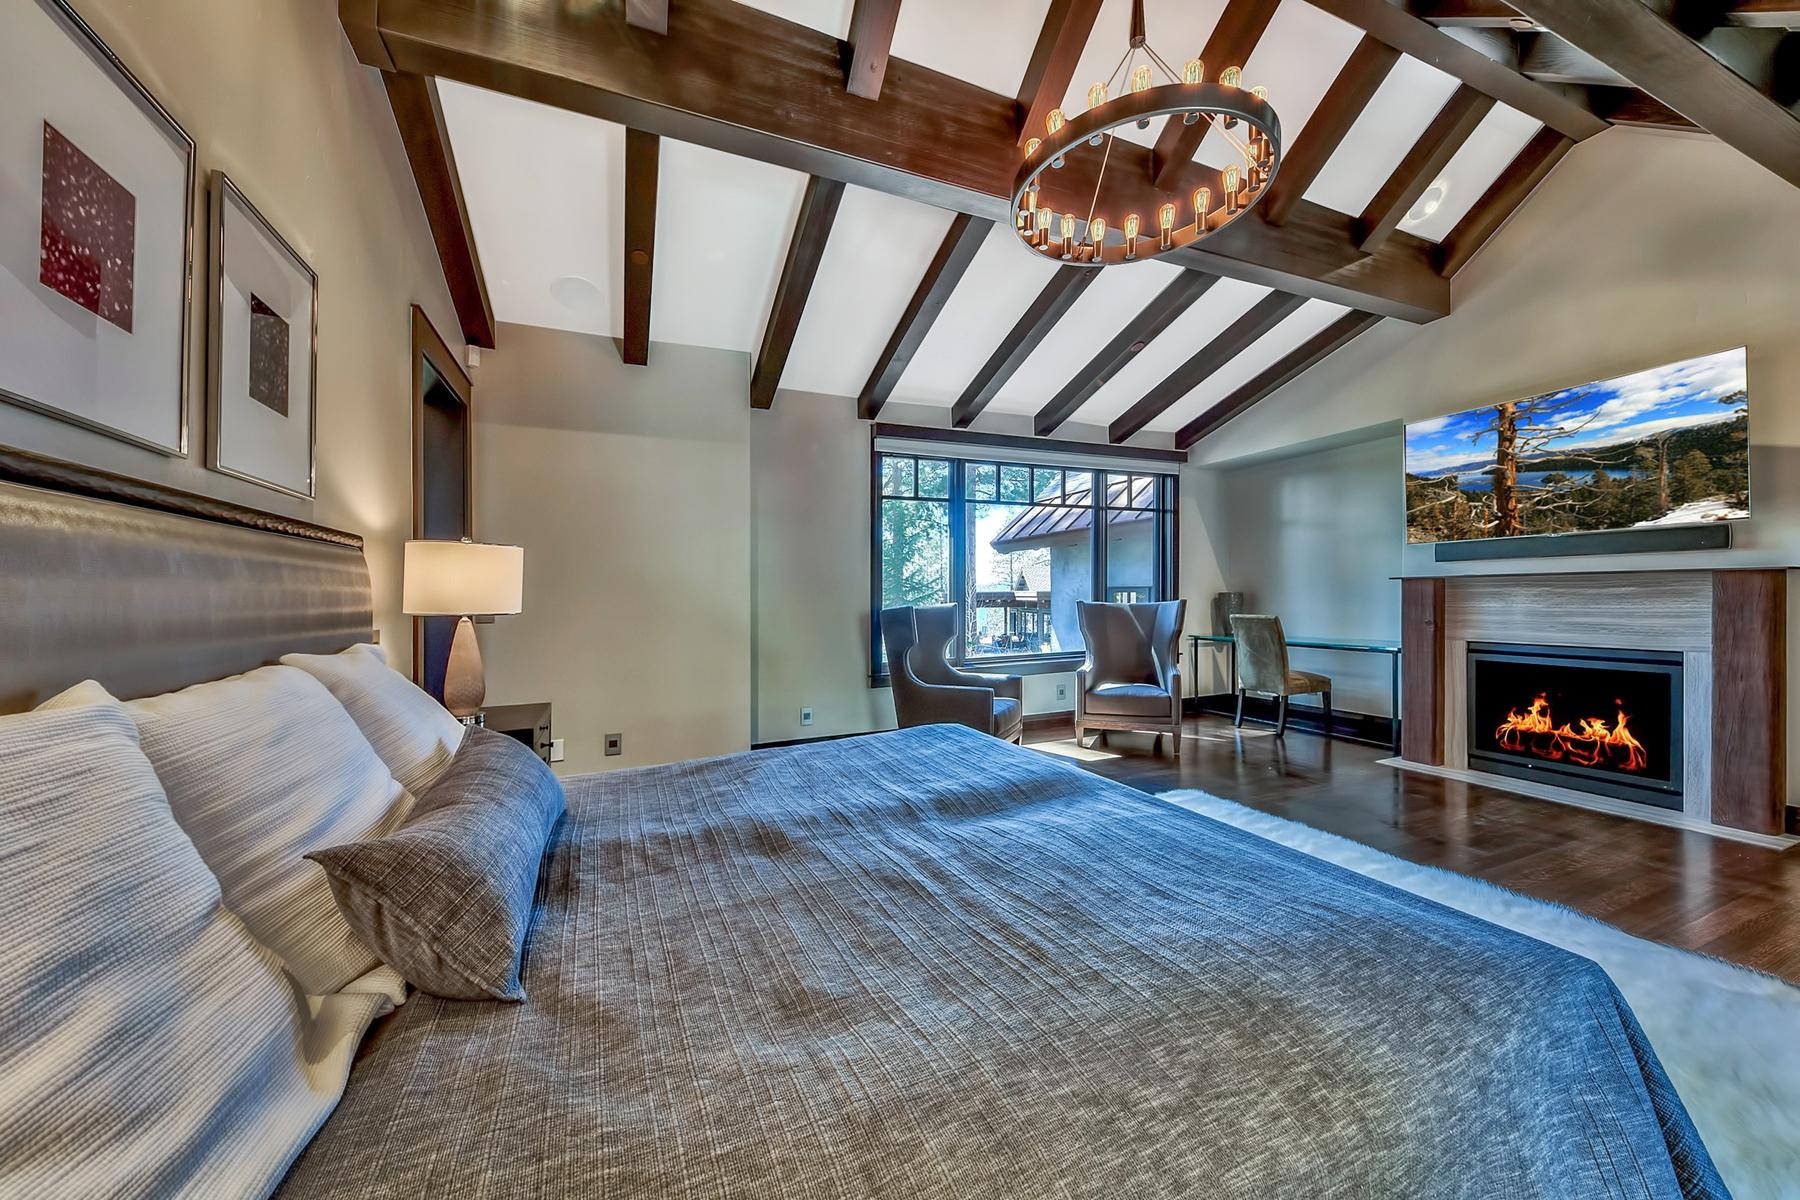 Additional photo for property listing at 759 Lakeshore Boulevard, Incline Village, Nevada 759 Lakeshore Boulevard Incline Village, Nevada 89451 United States